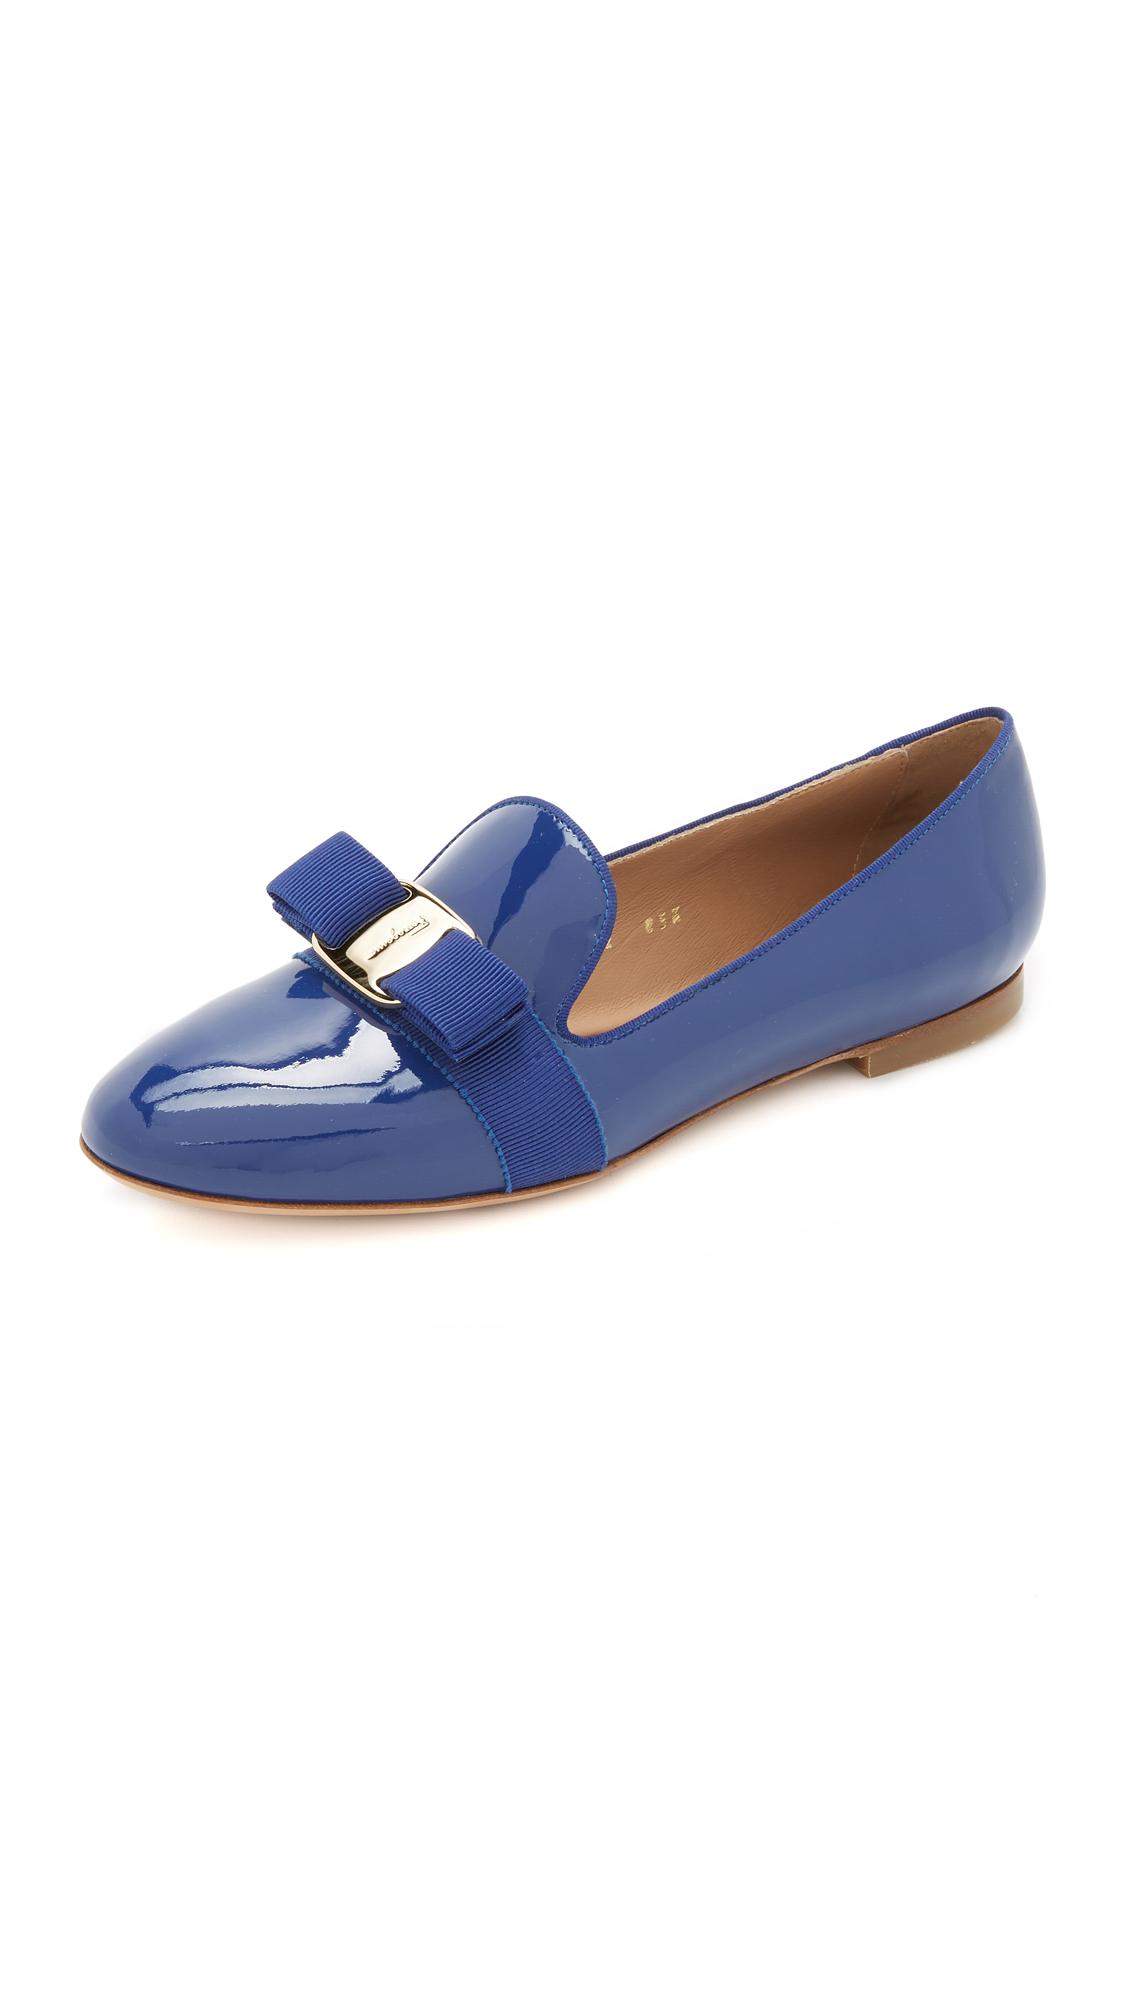 941633e76c2 Lyst - Ferragamo Scotty Loafers in Blue